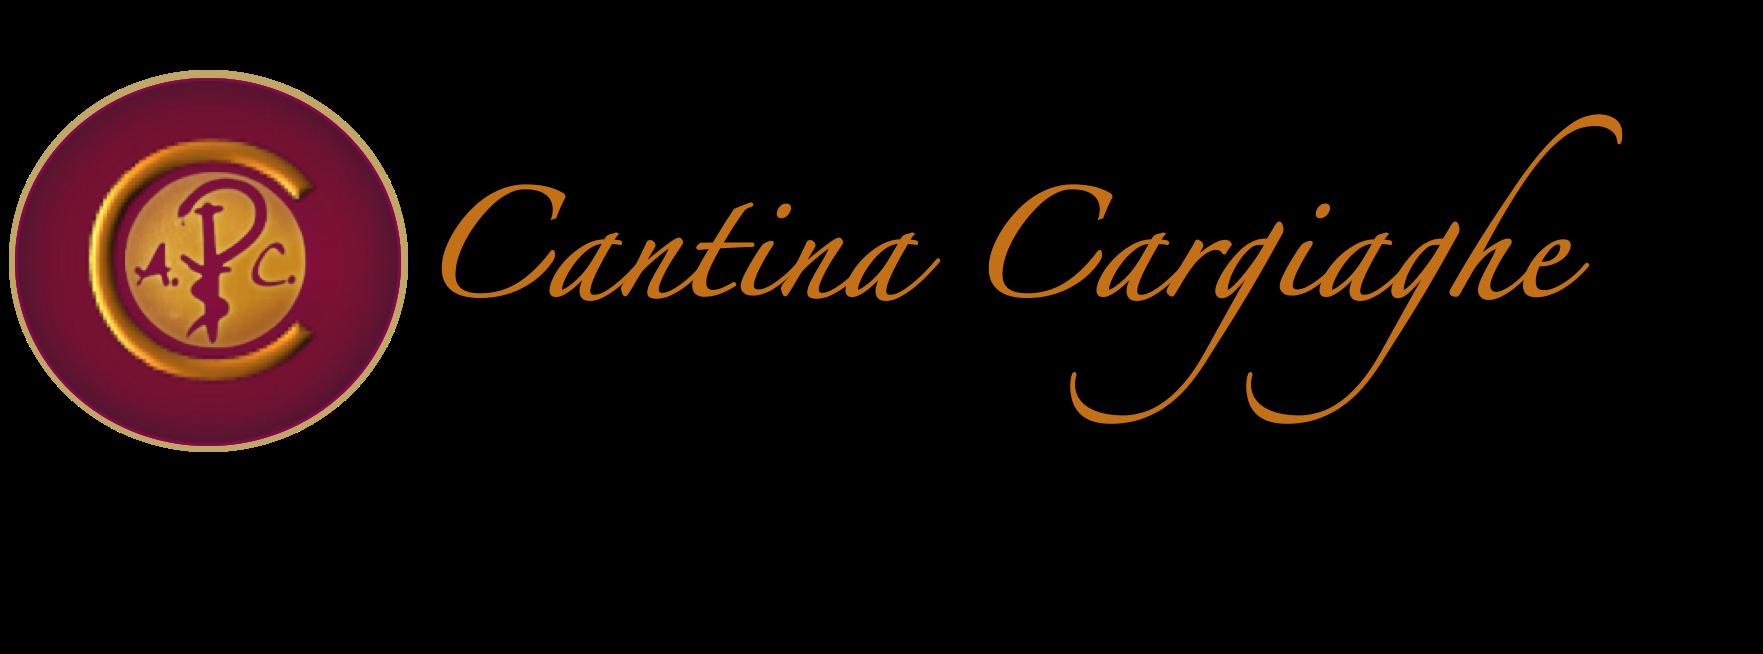 Cantina Cargiaghe